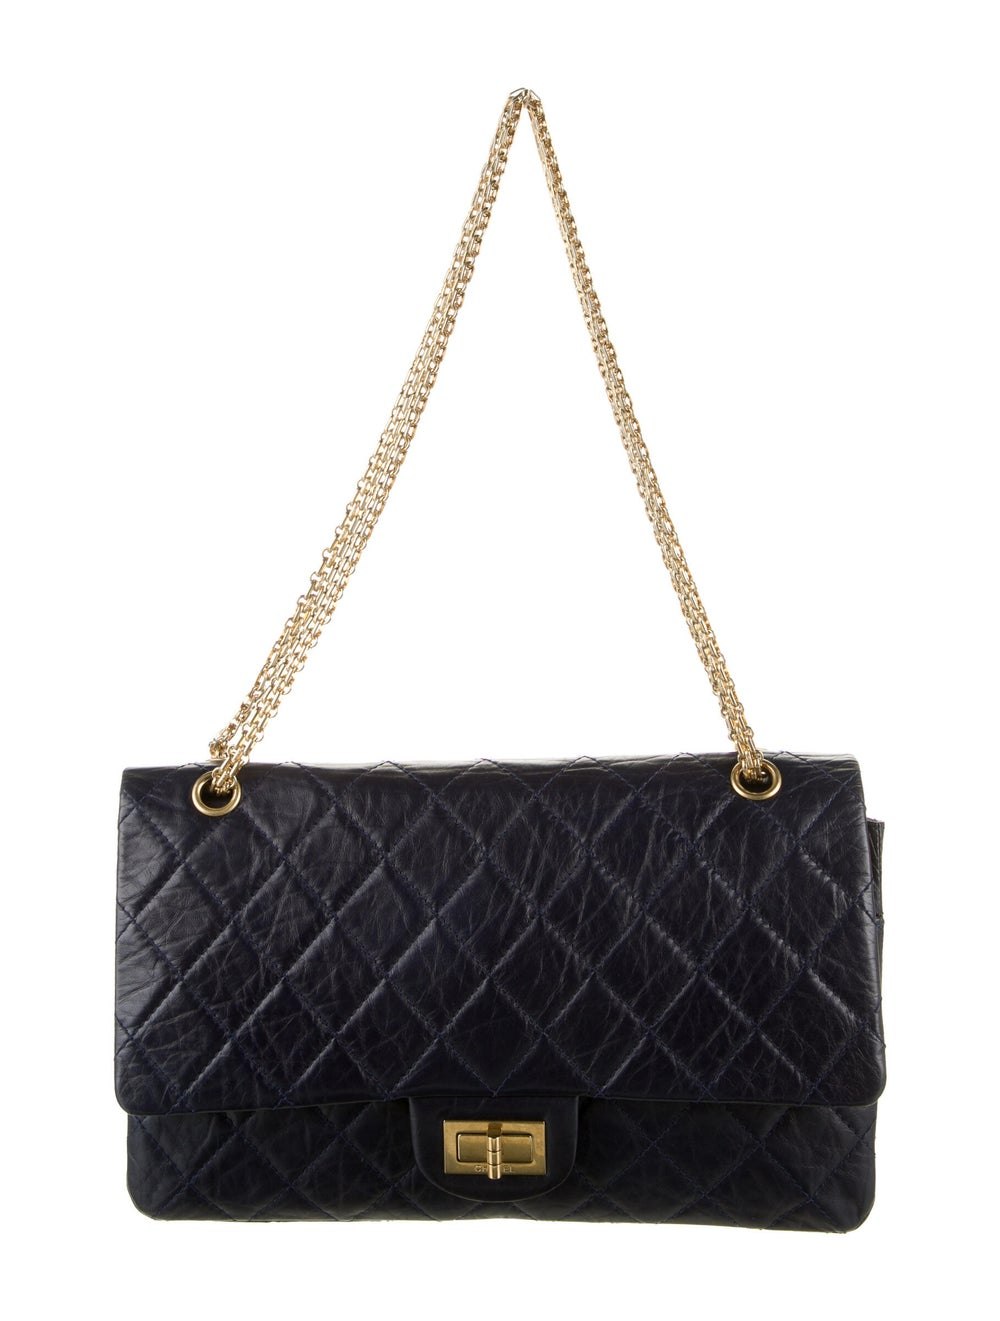 Chanel Reissue 227 Double Flap Bag Blue - image 1